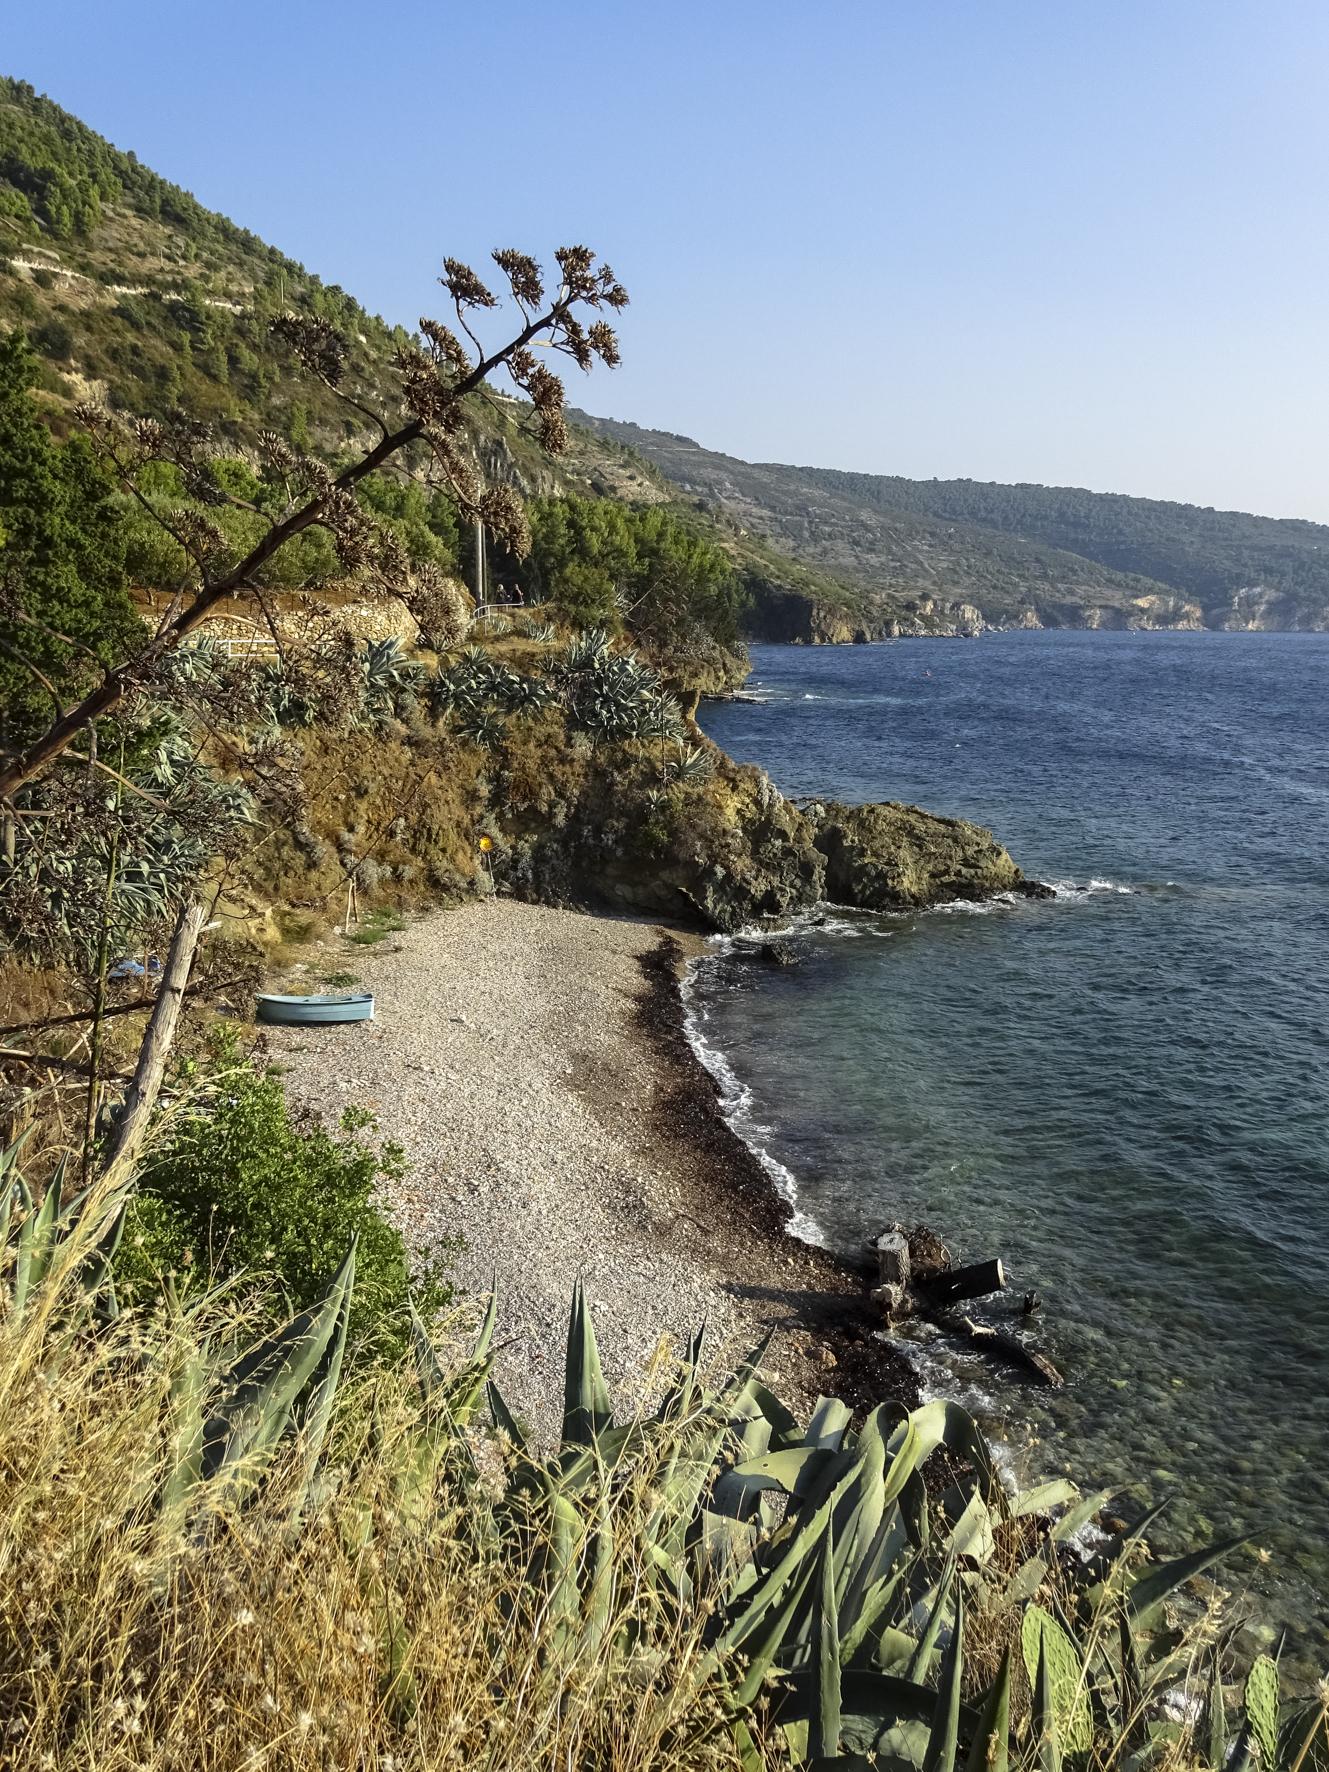 Kamenica Bucht bei Komiza (Insel Vis)